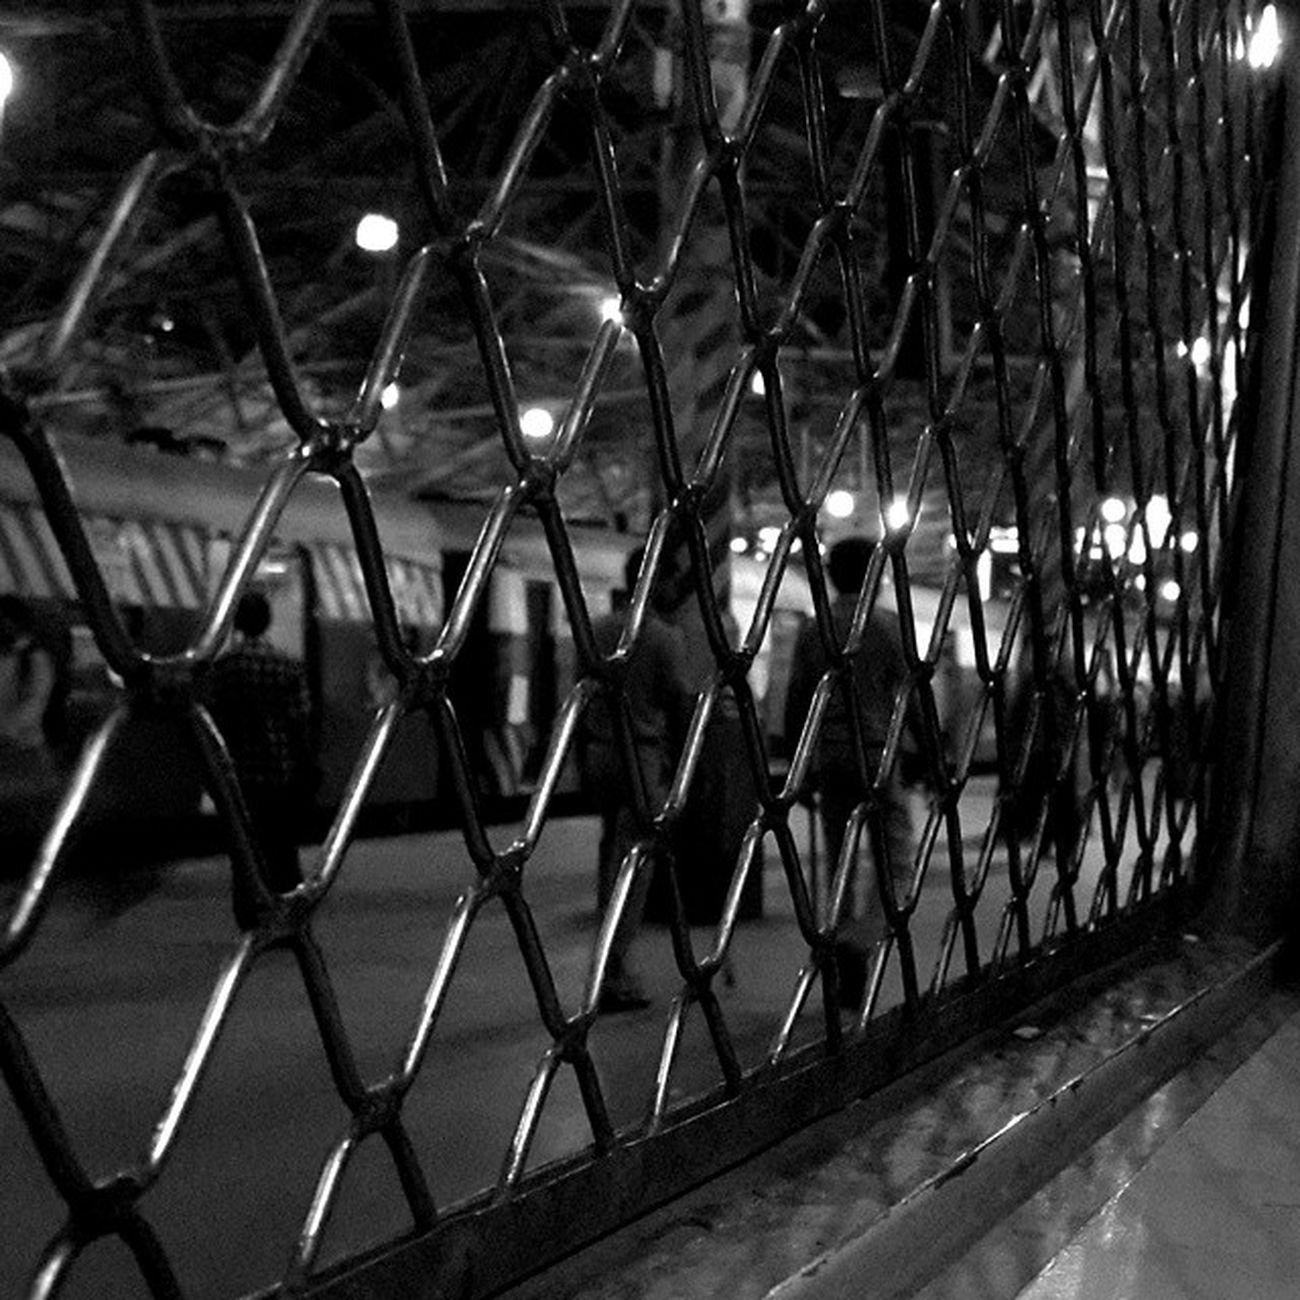 Mumbai local trains..... At CST station Bokeh Hangout Friends Grantrode s4motolocalcpulove this clickMumbaimyMumbai